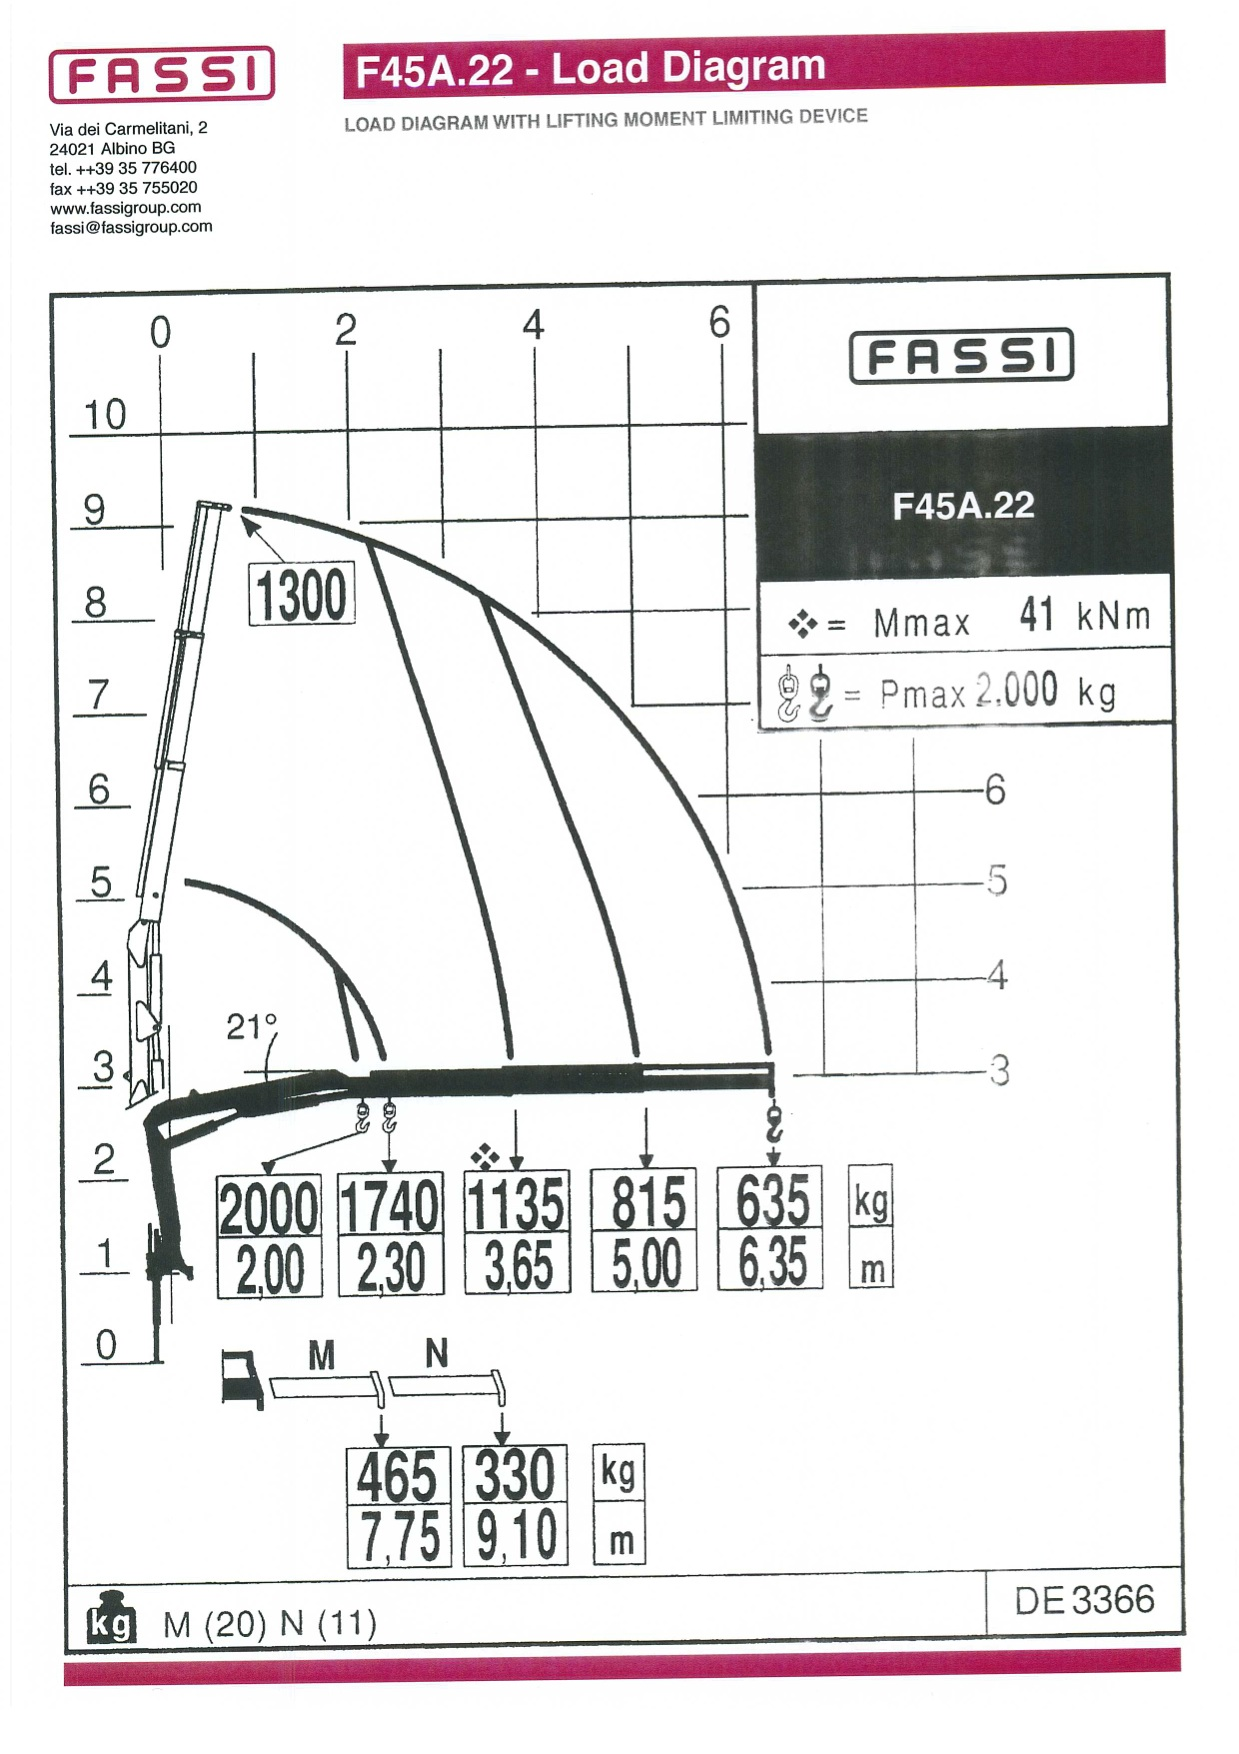 MADDAZ-Isuzu-FTR34-Hirail-Crane-3-Way_Tipper-Flat-Top-Load-Chart.jpg